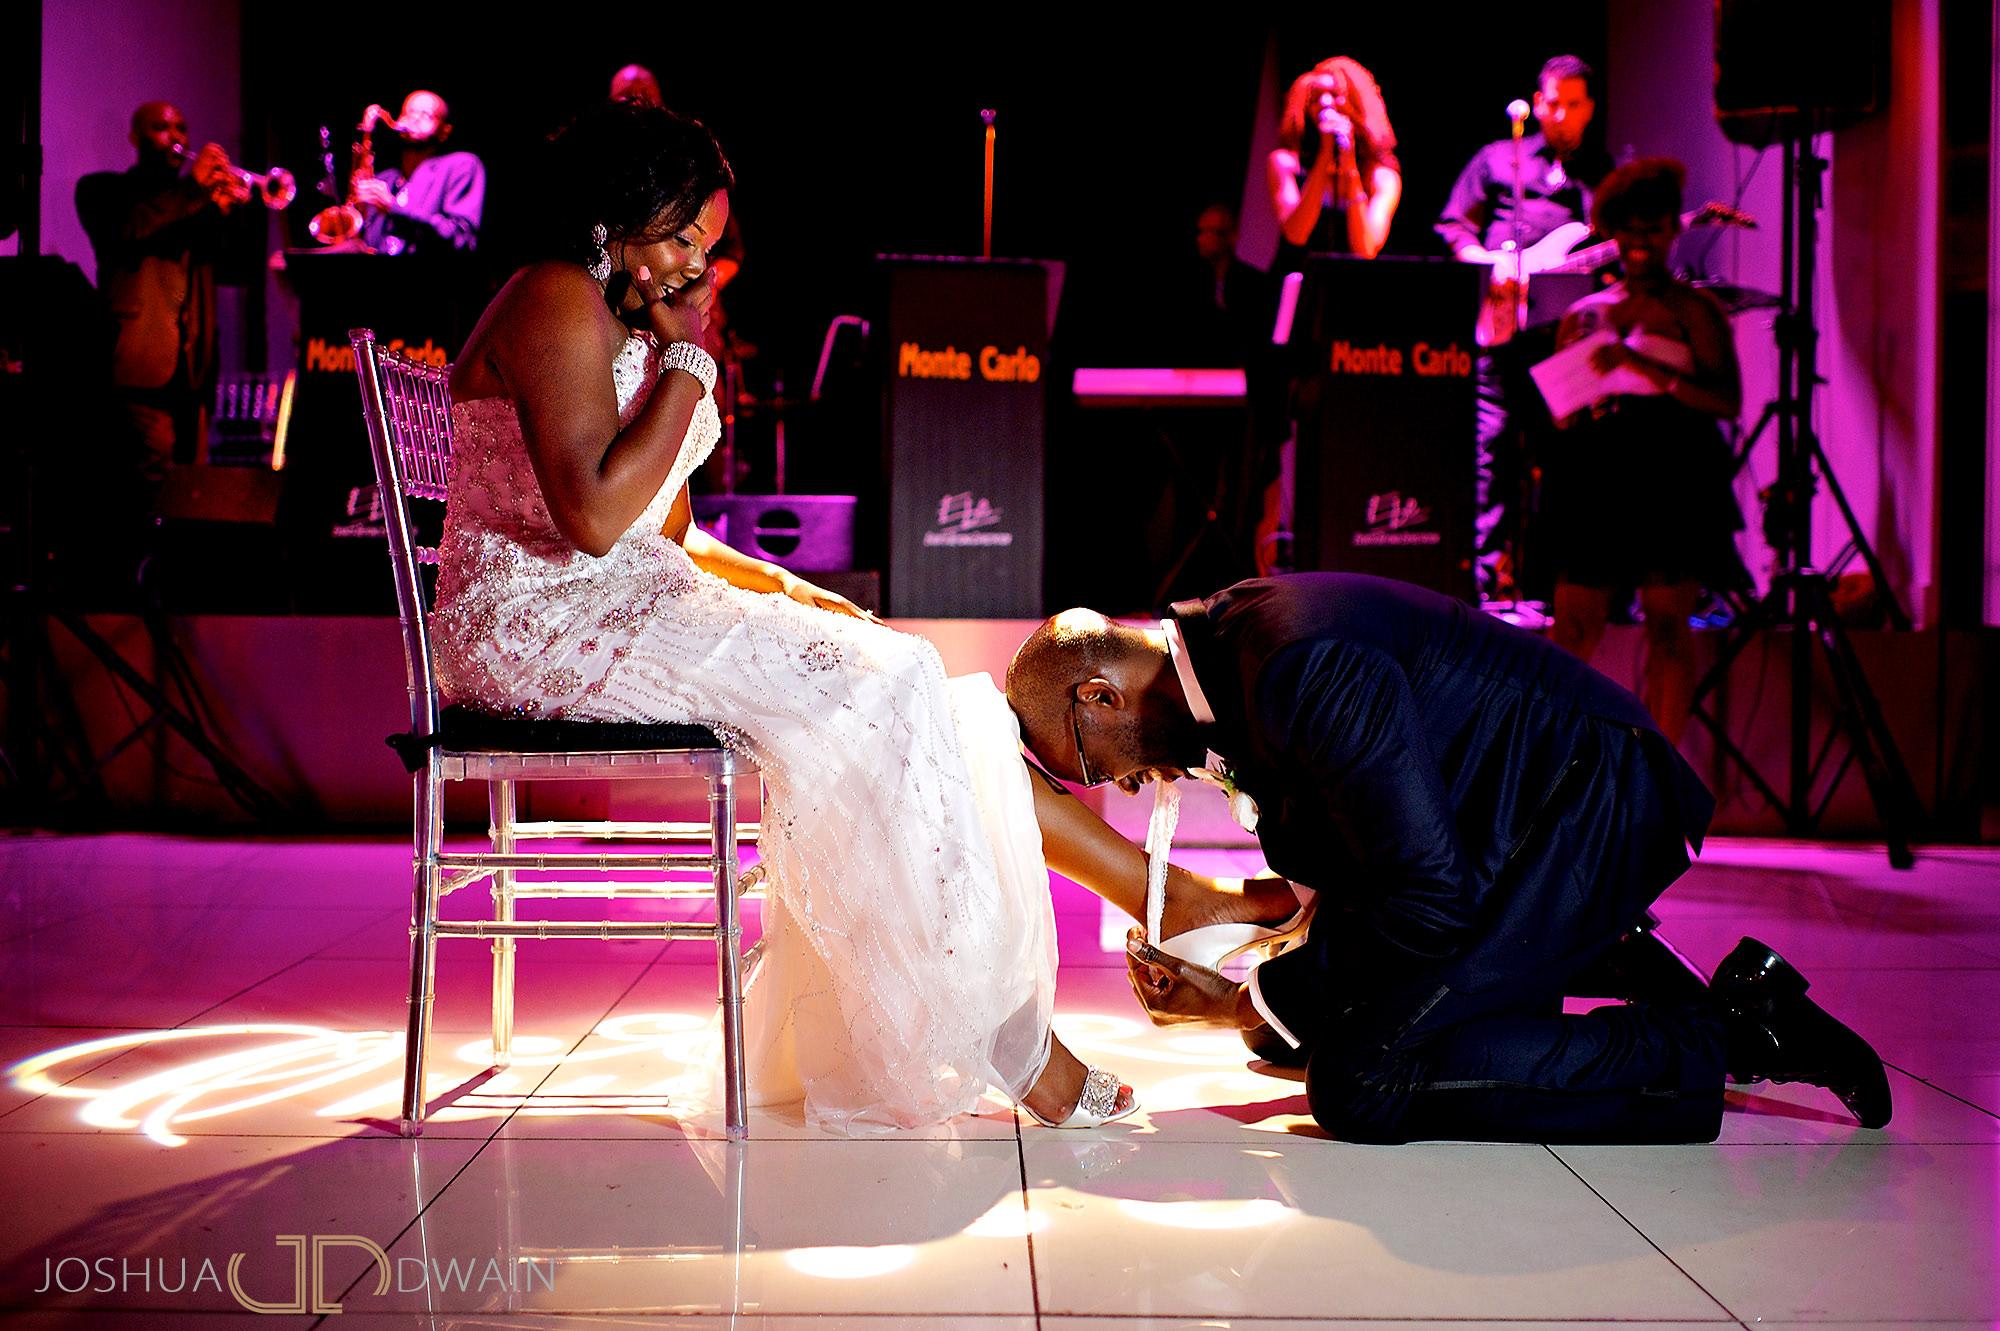 tiffany-udo-018-tendenza-philadelphia-pa-wedding-photographer-joshua-dwain-photography-